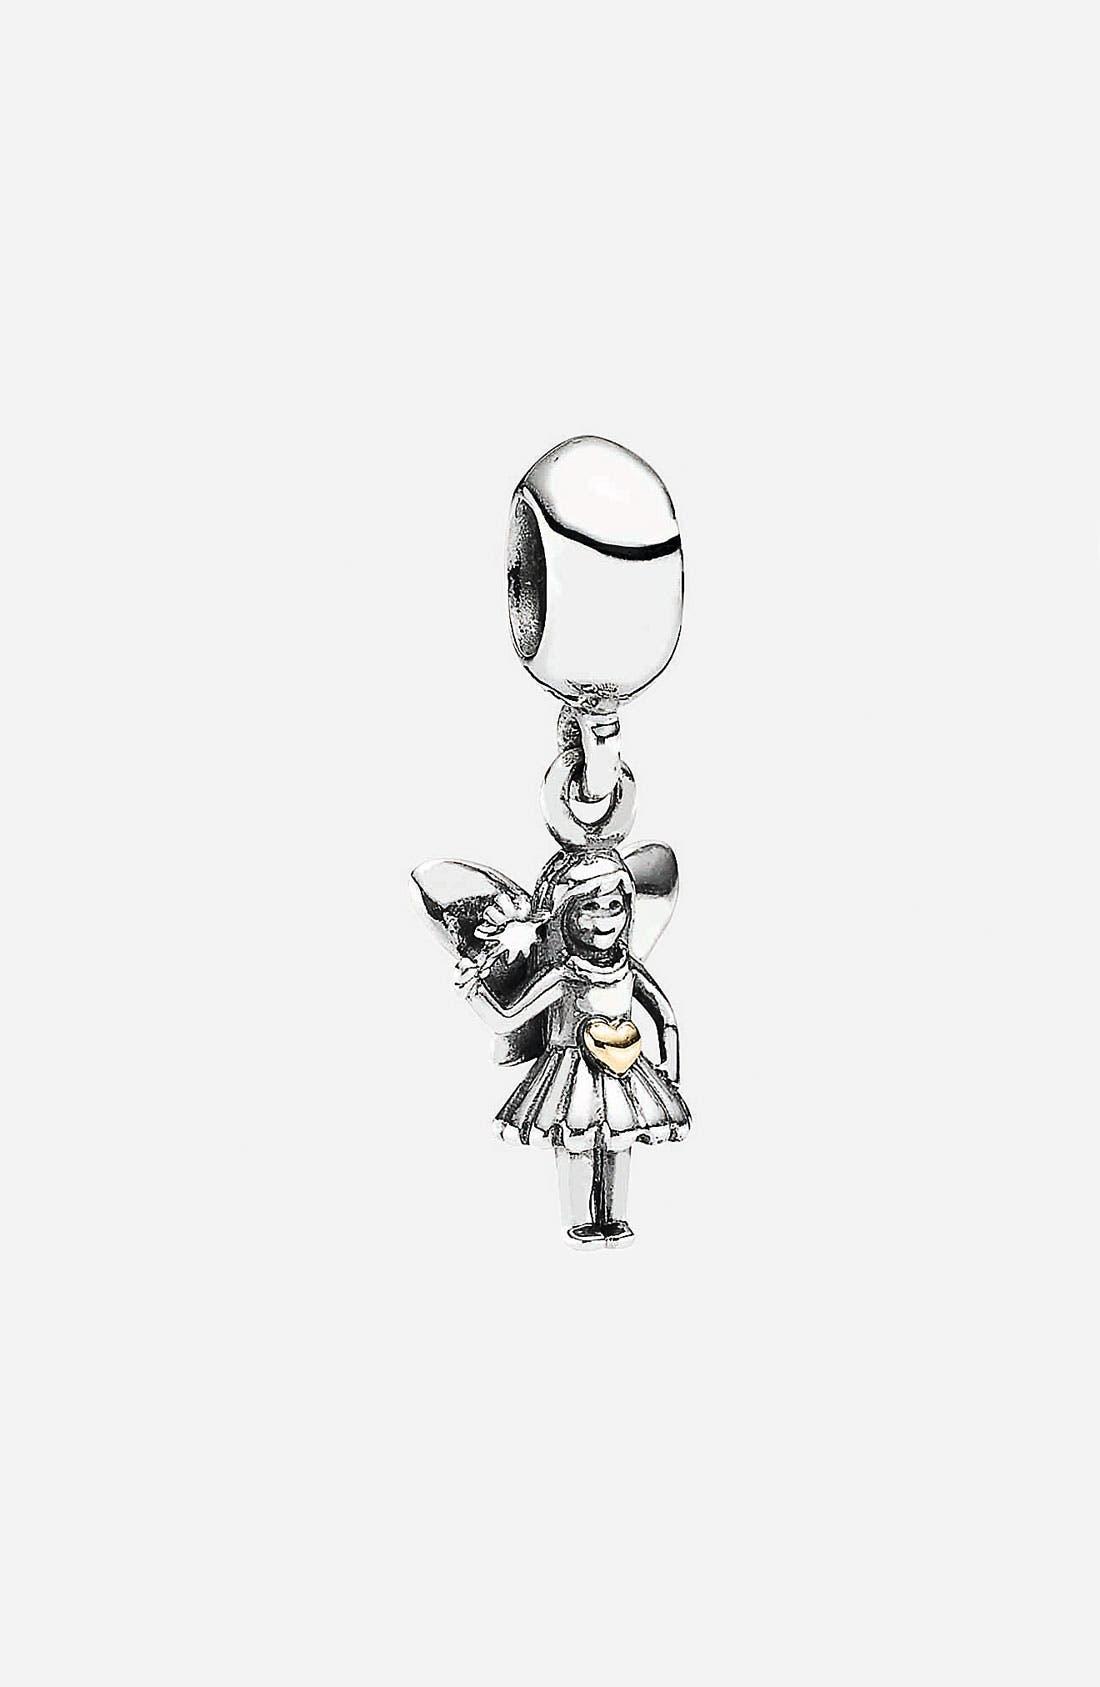 Alternate Image 1 Selected - PANDORA 'Fairytale' Dangle Charm